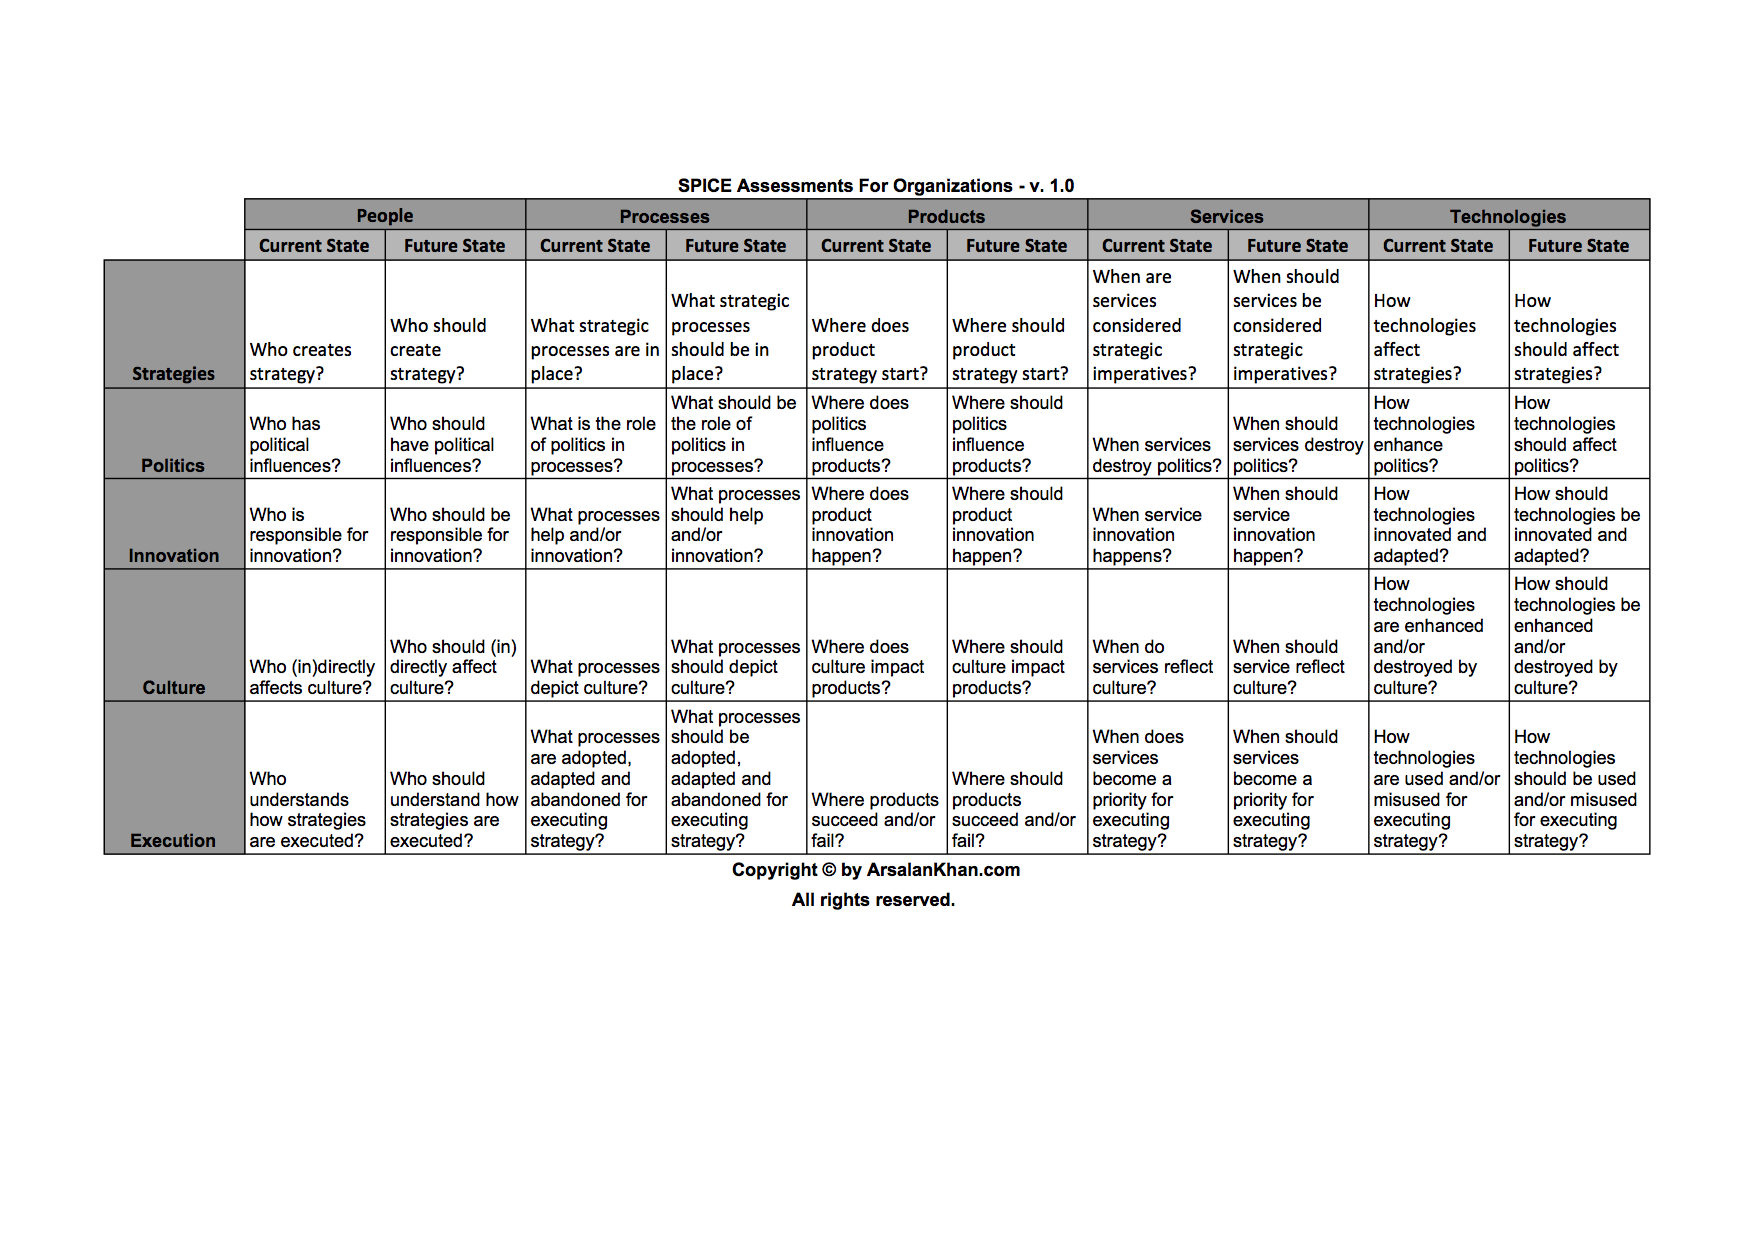 SPICE Assessments For Organizations - v. 1.0